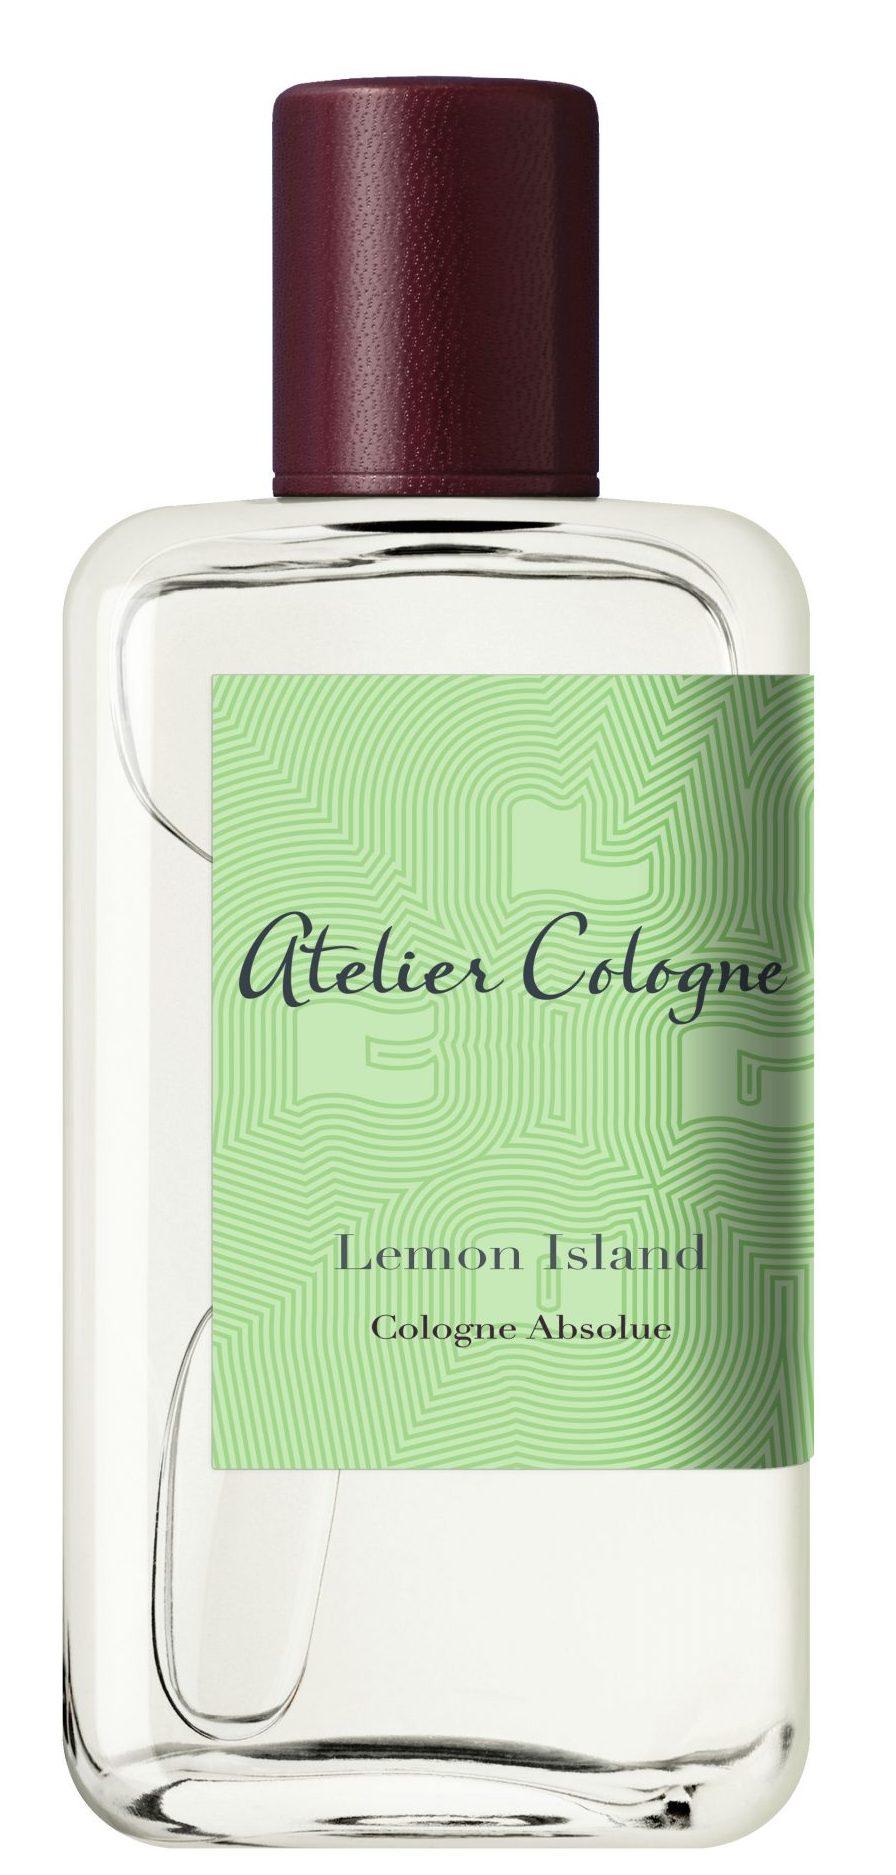 ATELIER_COLOGNE_LEMON_ISLAND